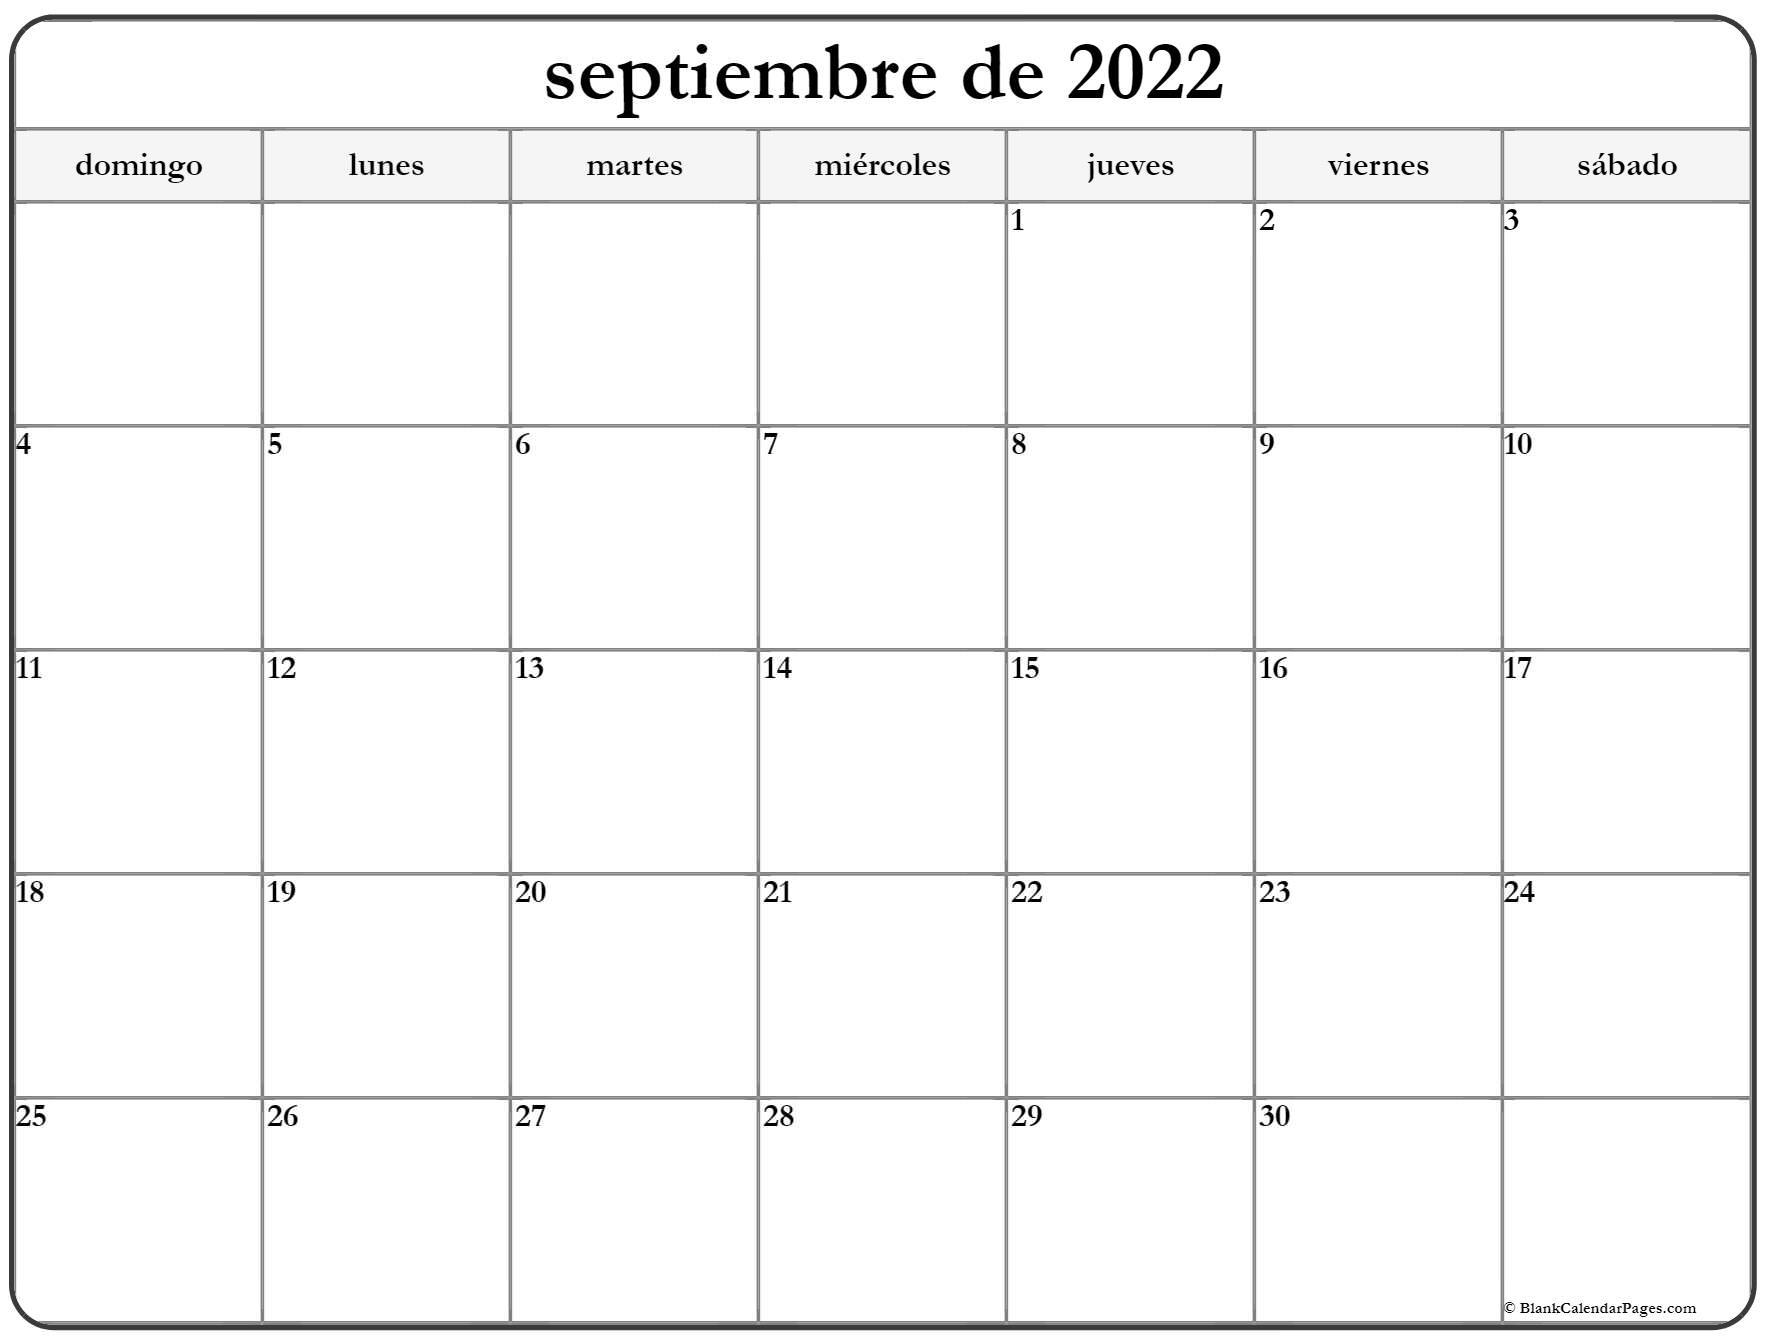 septiembre de 2022 calendrario